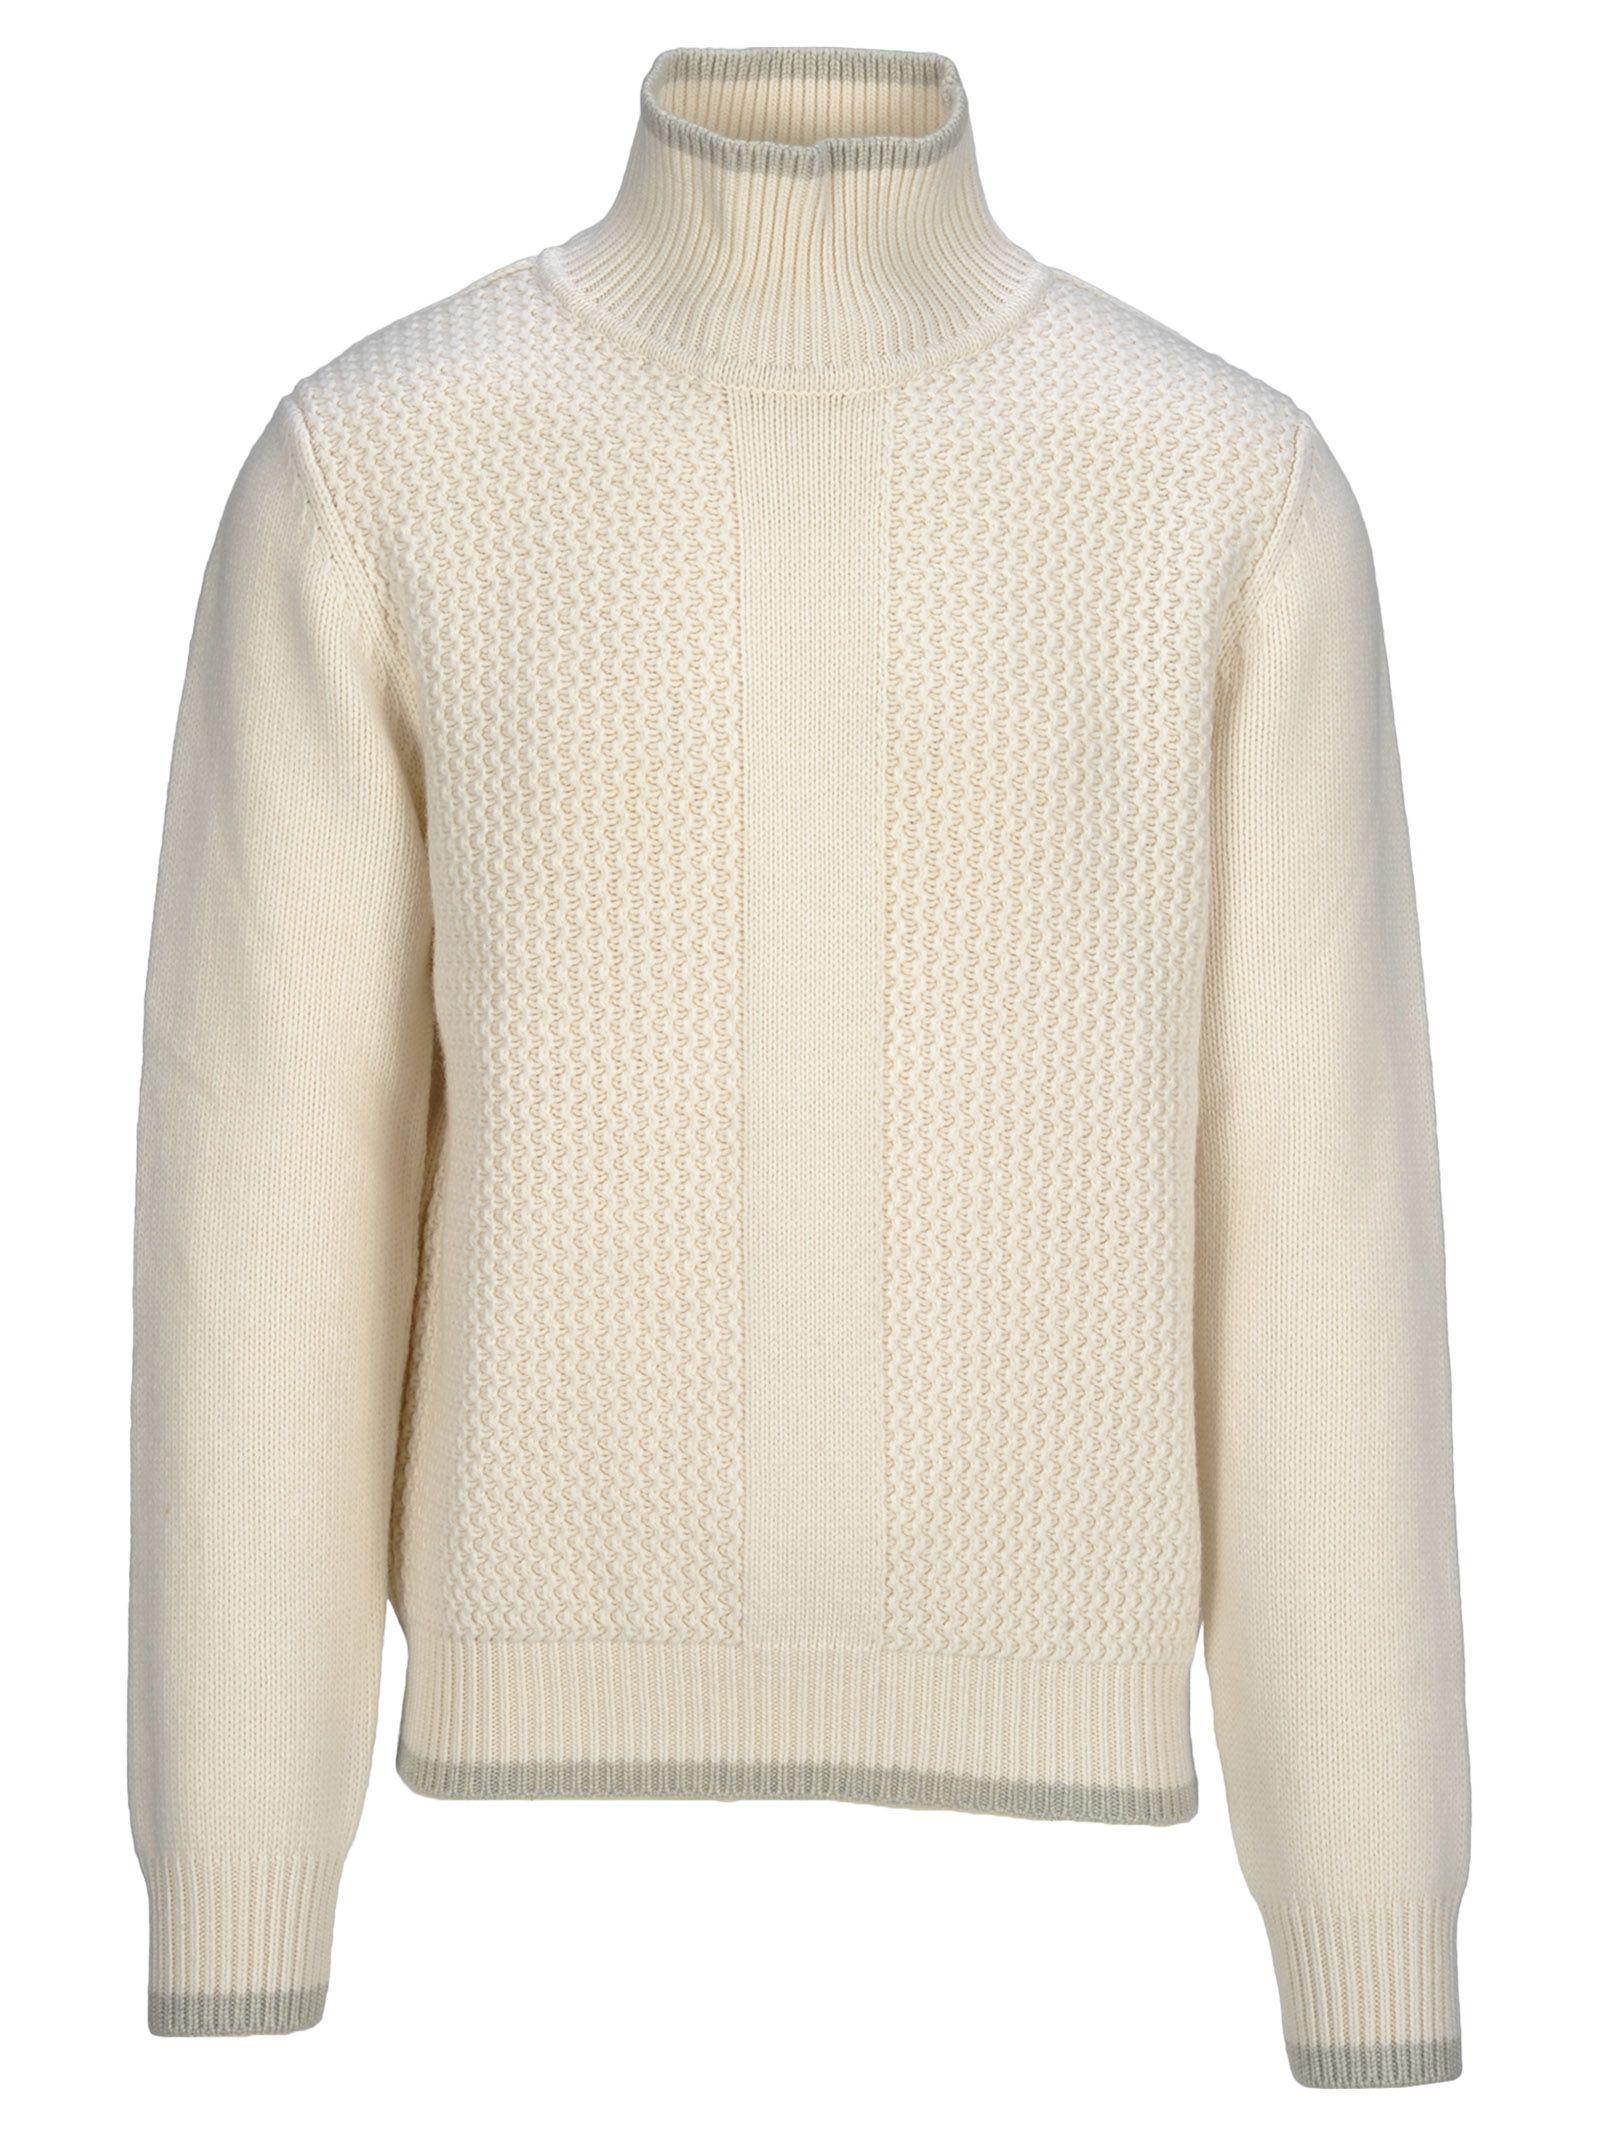 Salvatore Ferragamo Knit High Neck